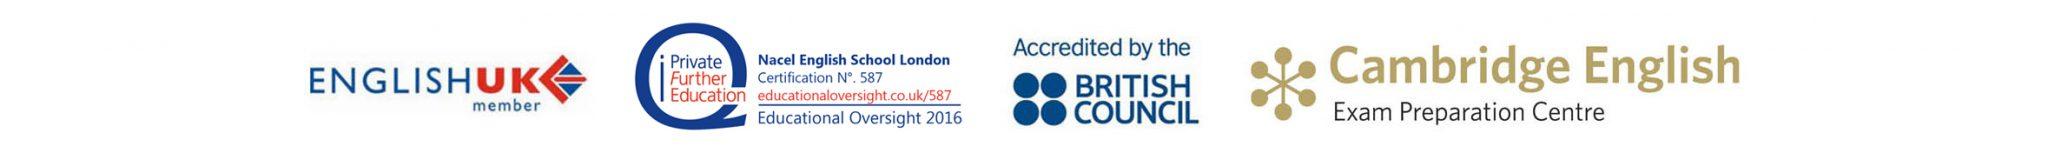 accreditations